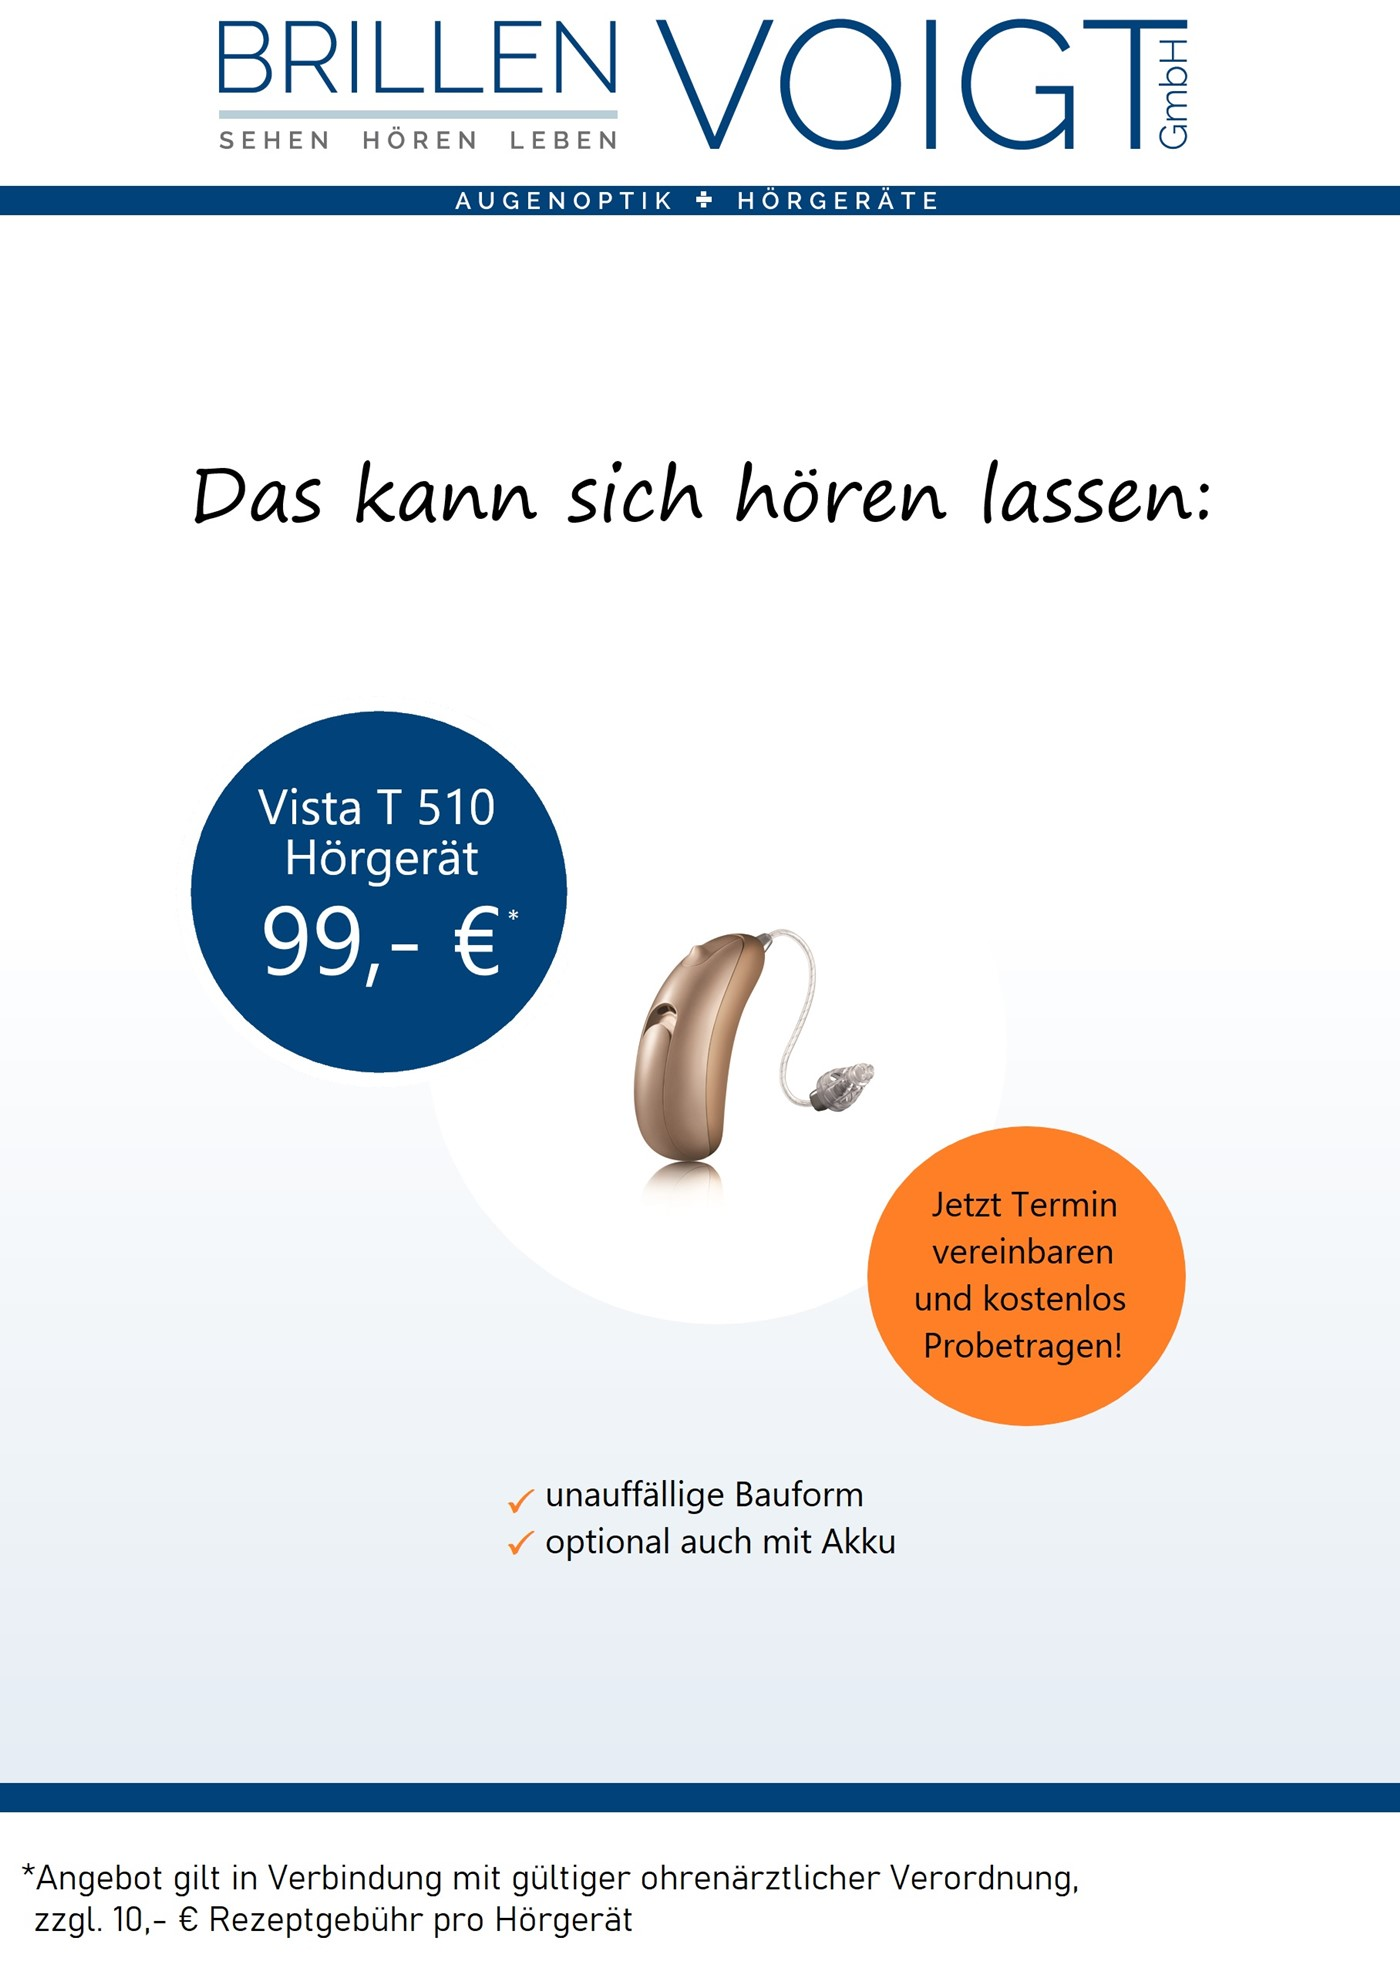 Vista Hörgeräte ab 99 Euro Zuzahlung